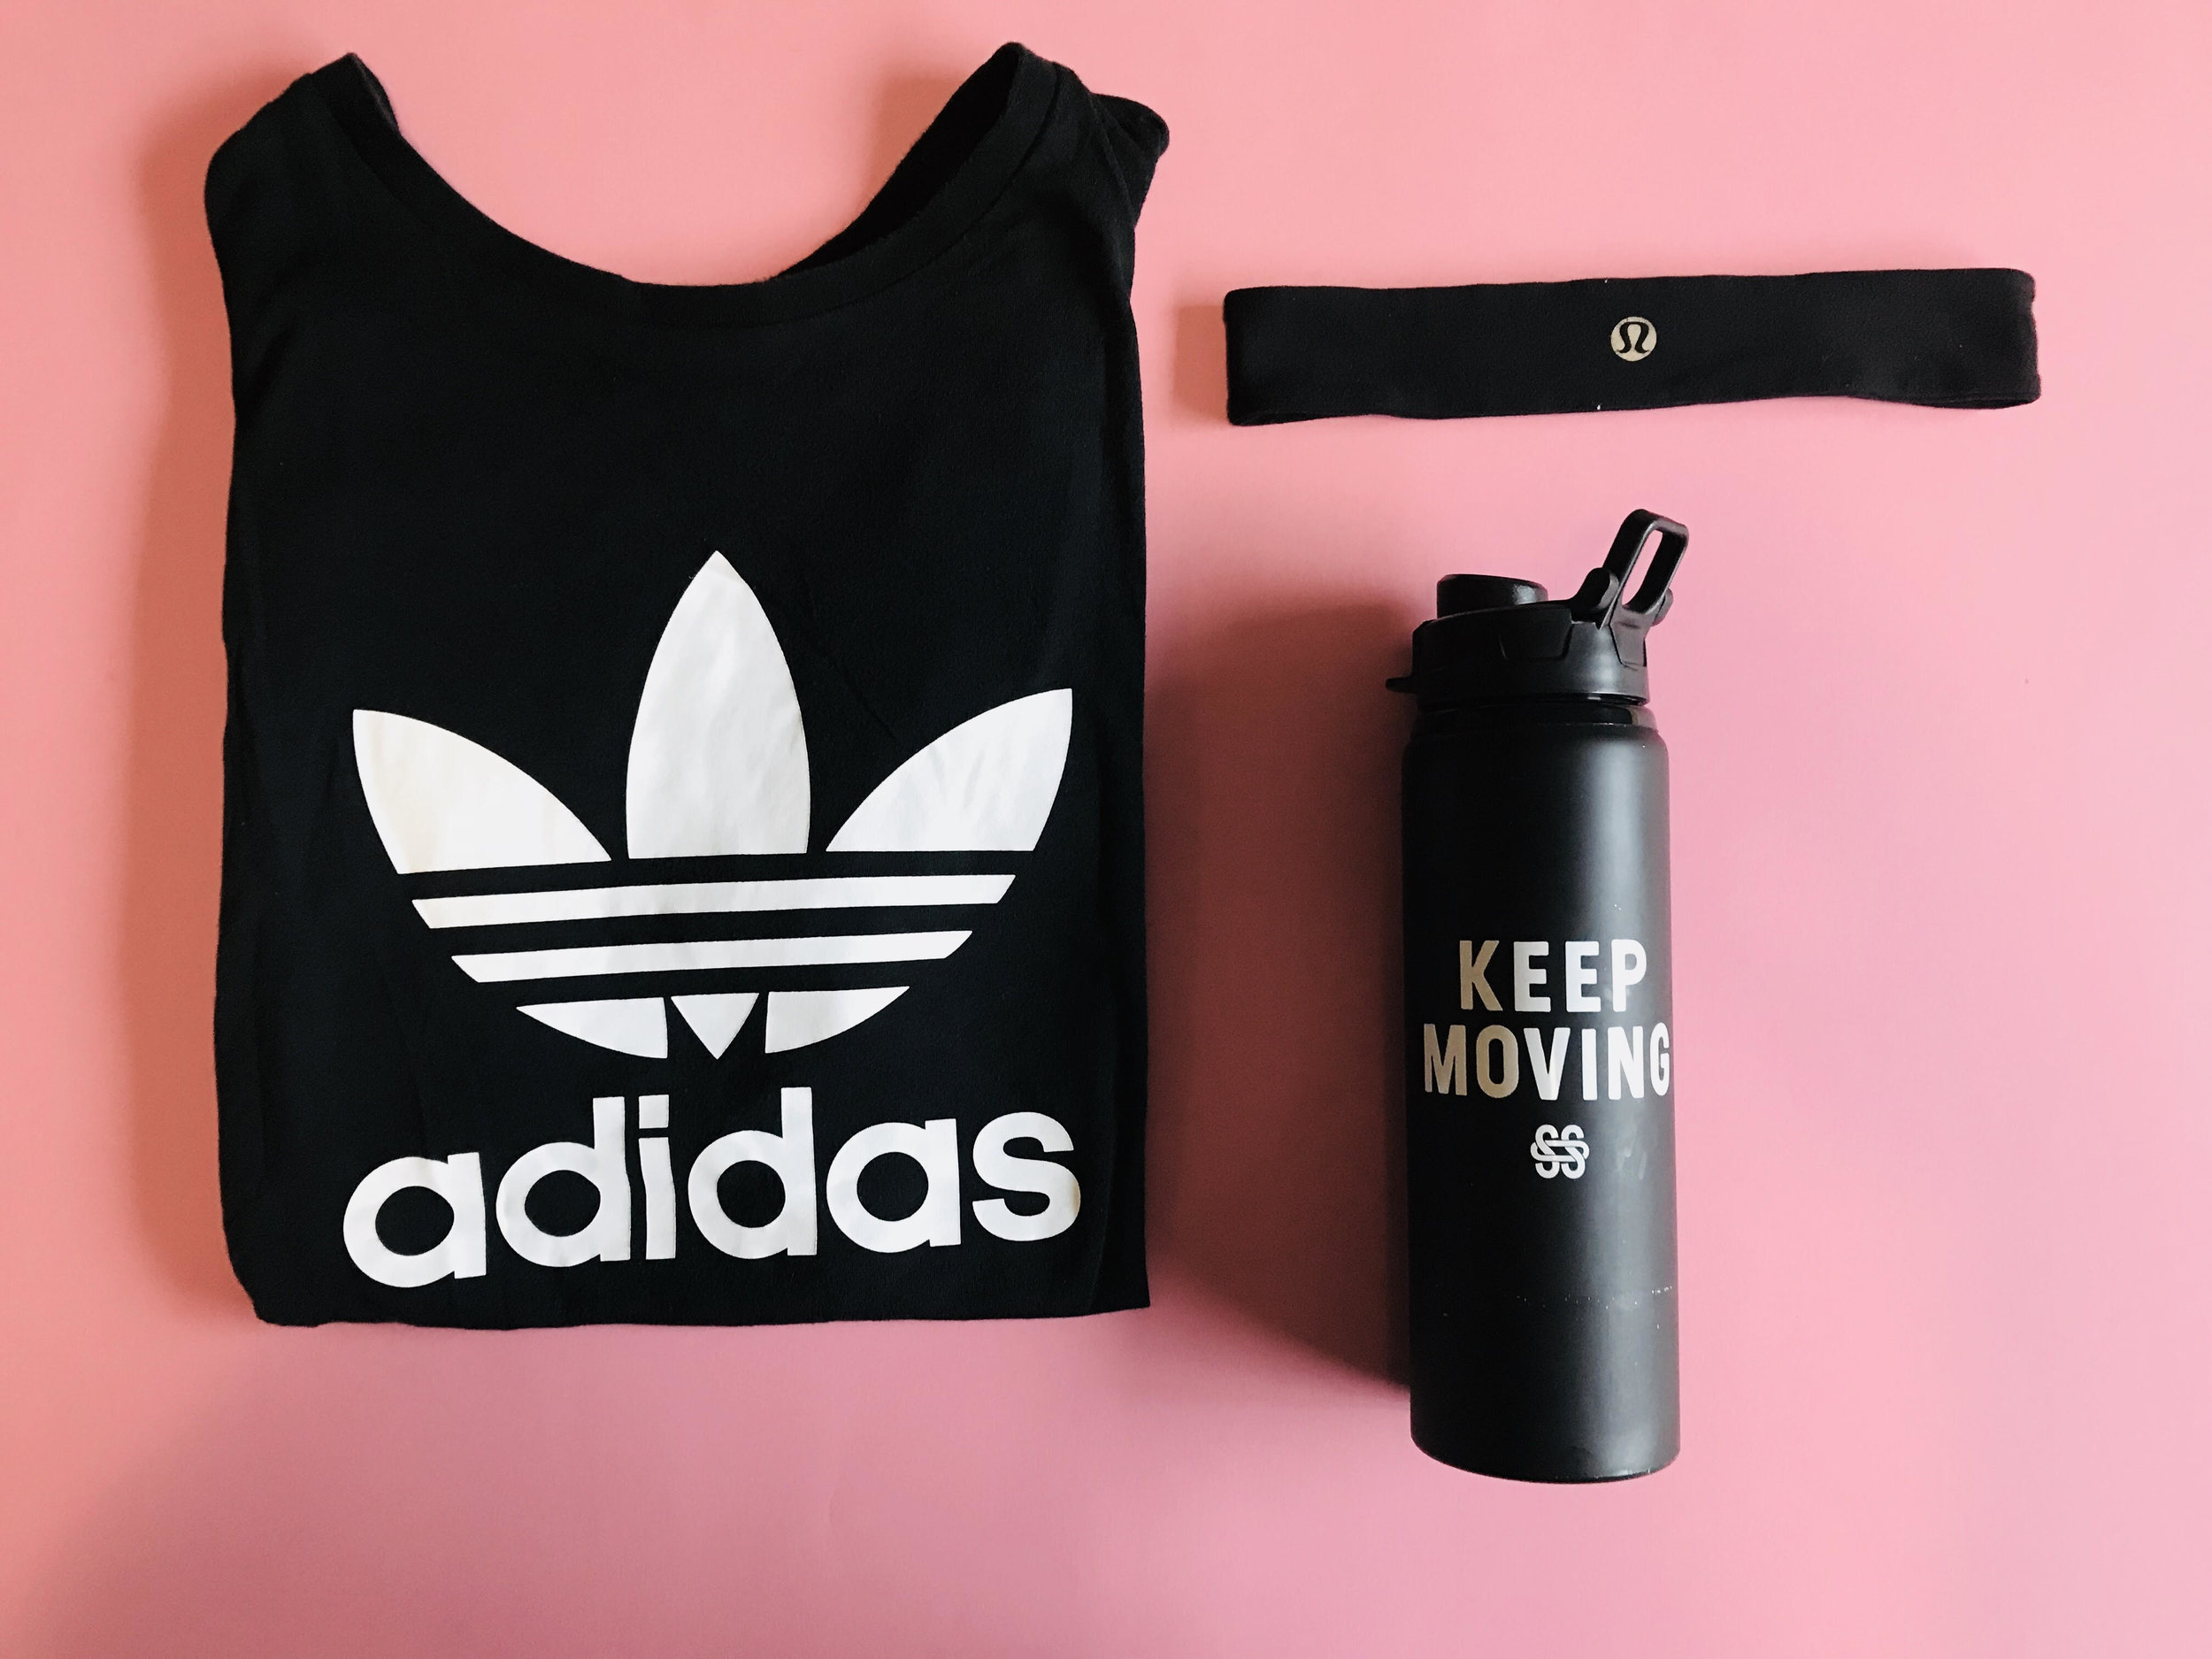 Adidas shirt - $4 -  Second chance consignment shop /  lululemon headband - $8 -  second chance consignment shop